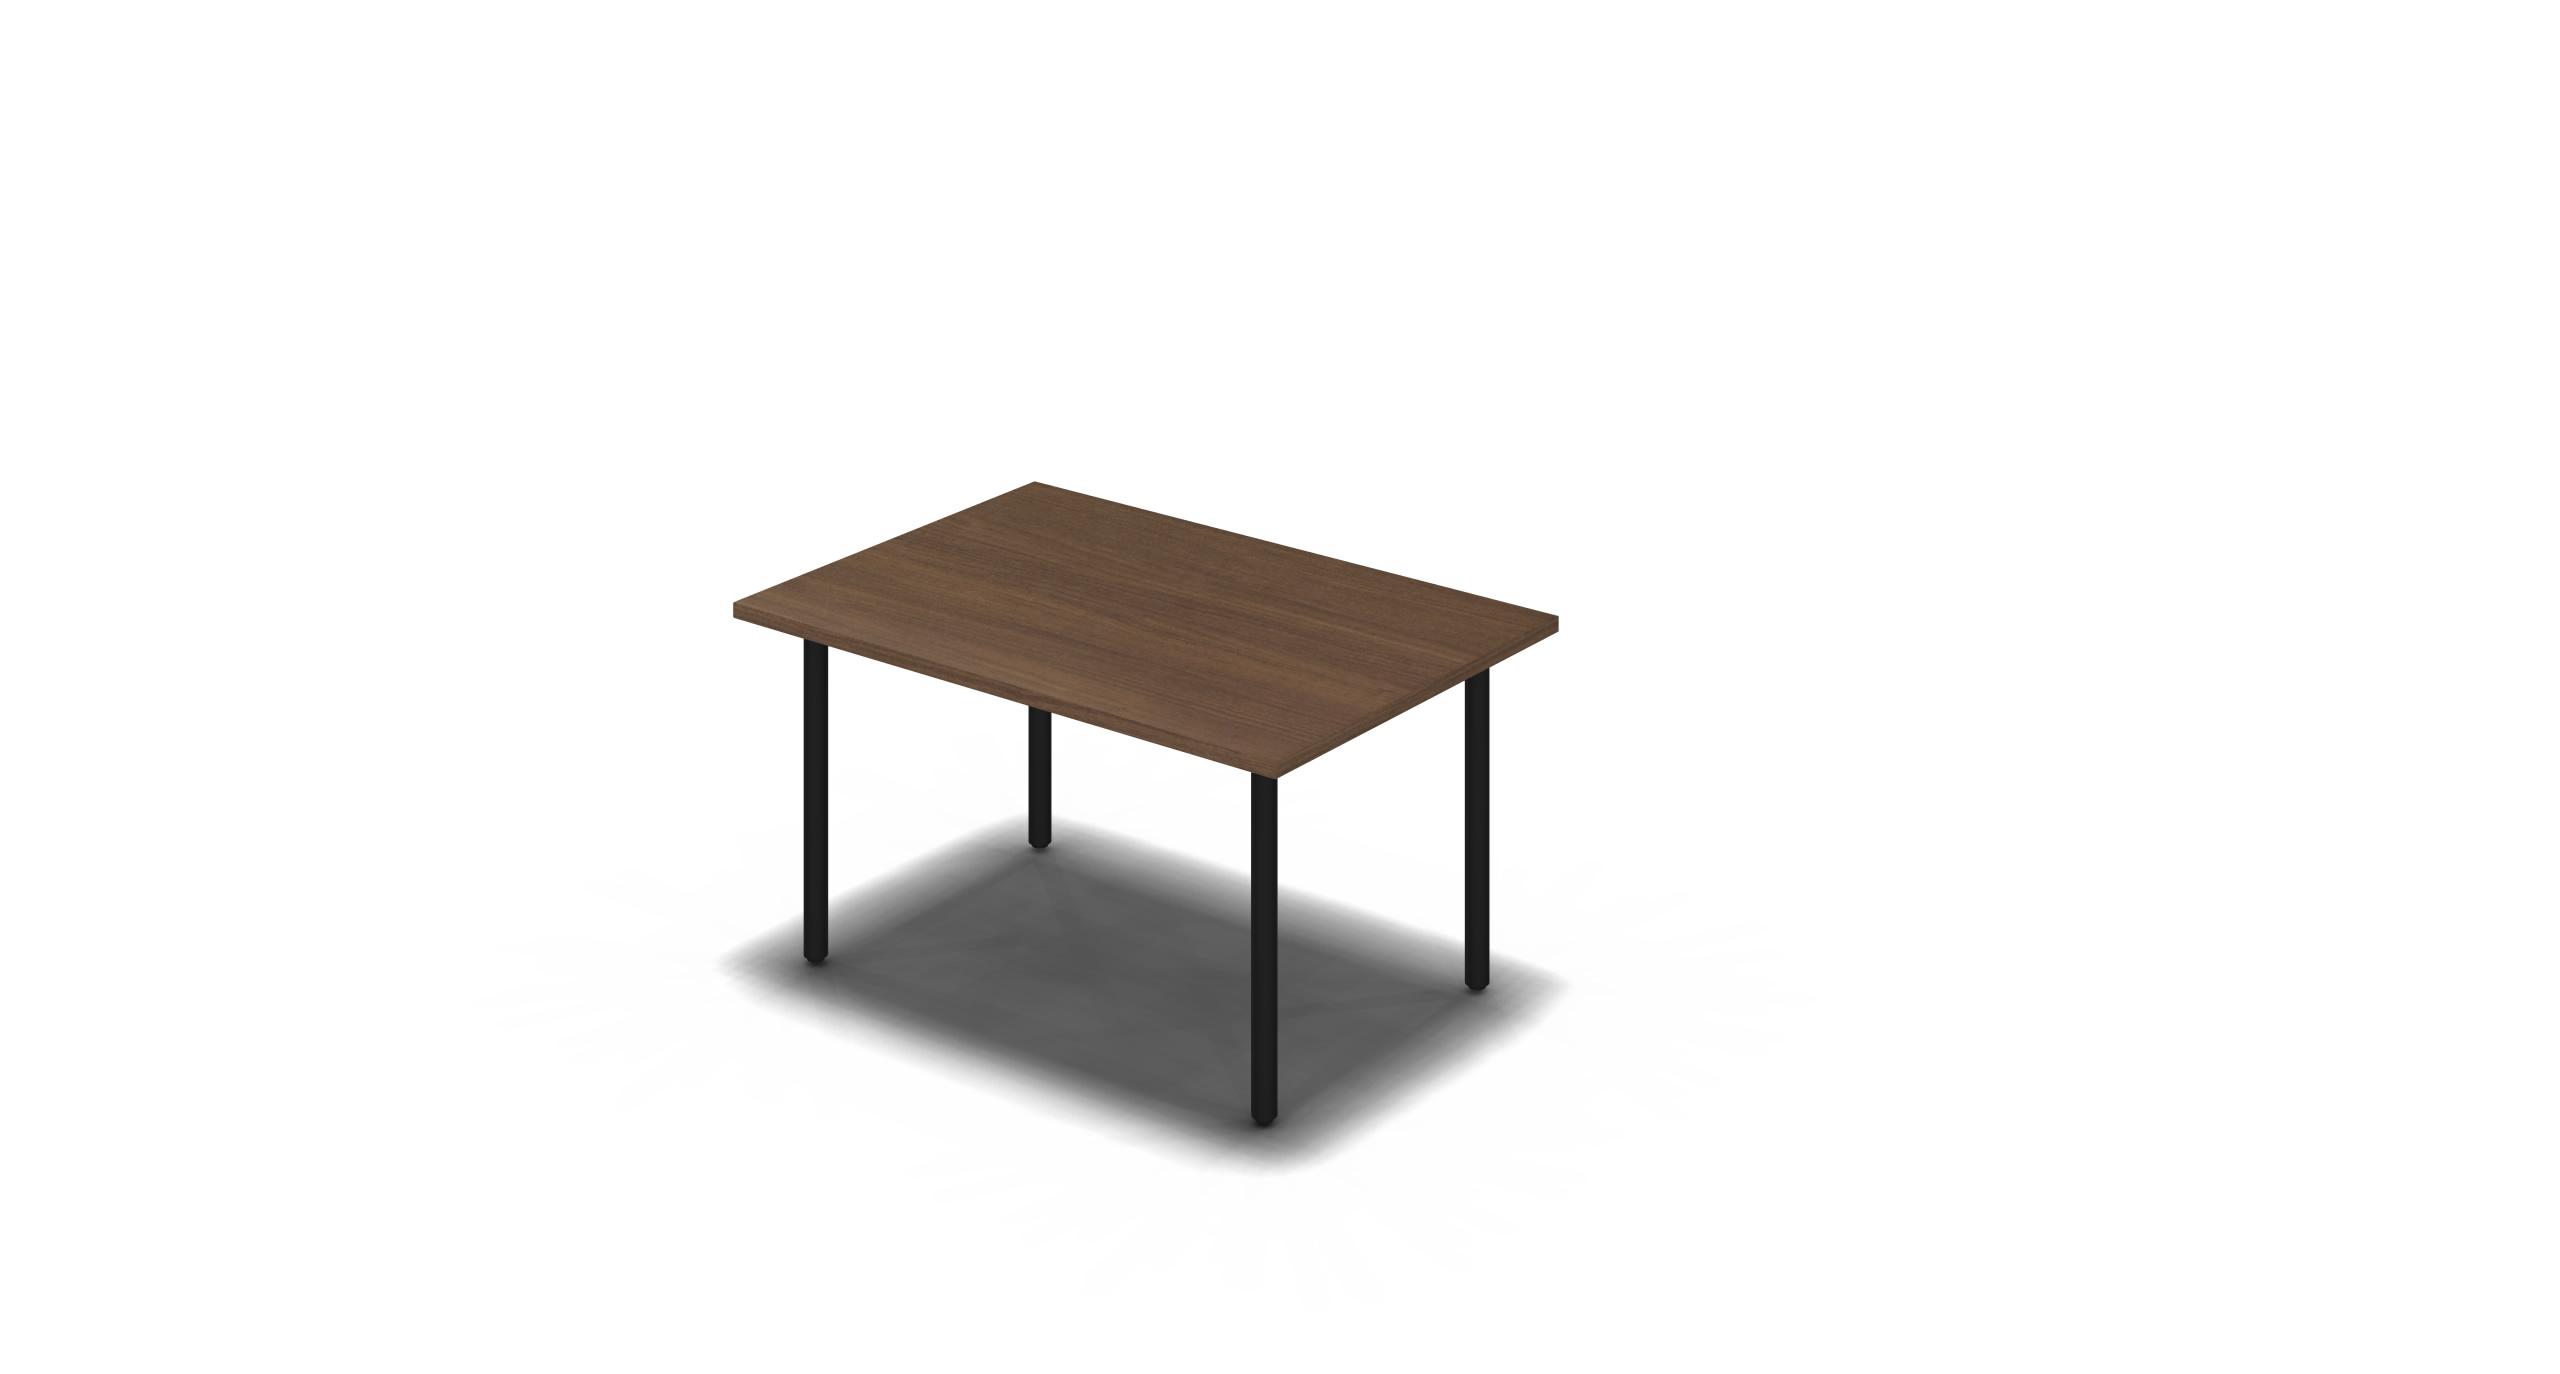 Table_Round_1200x800_Black_Walnut_noOption